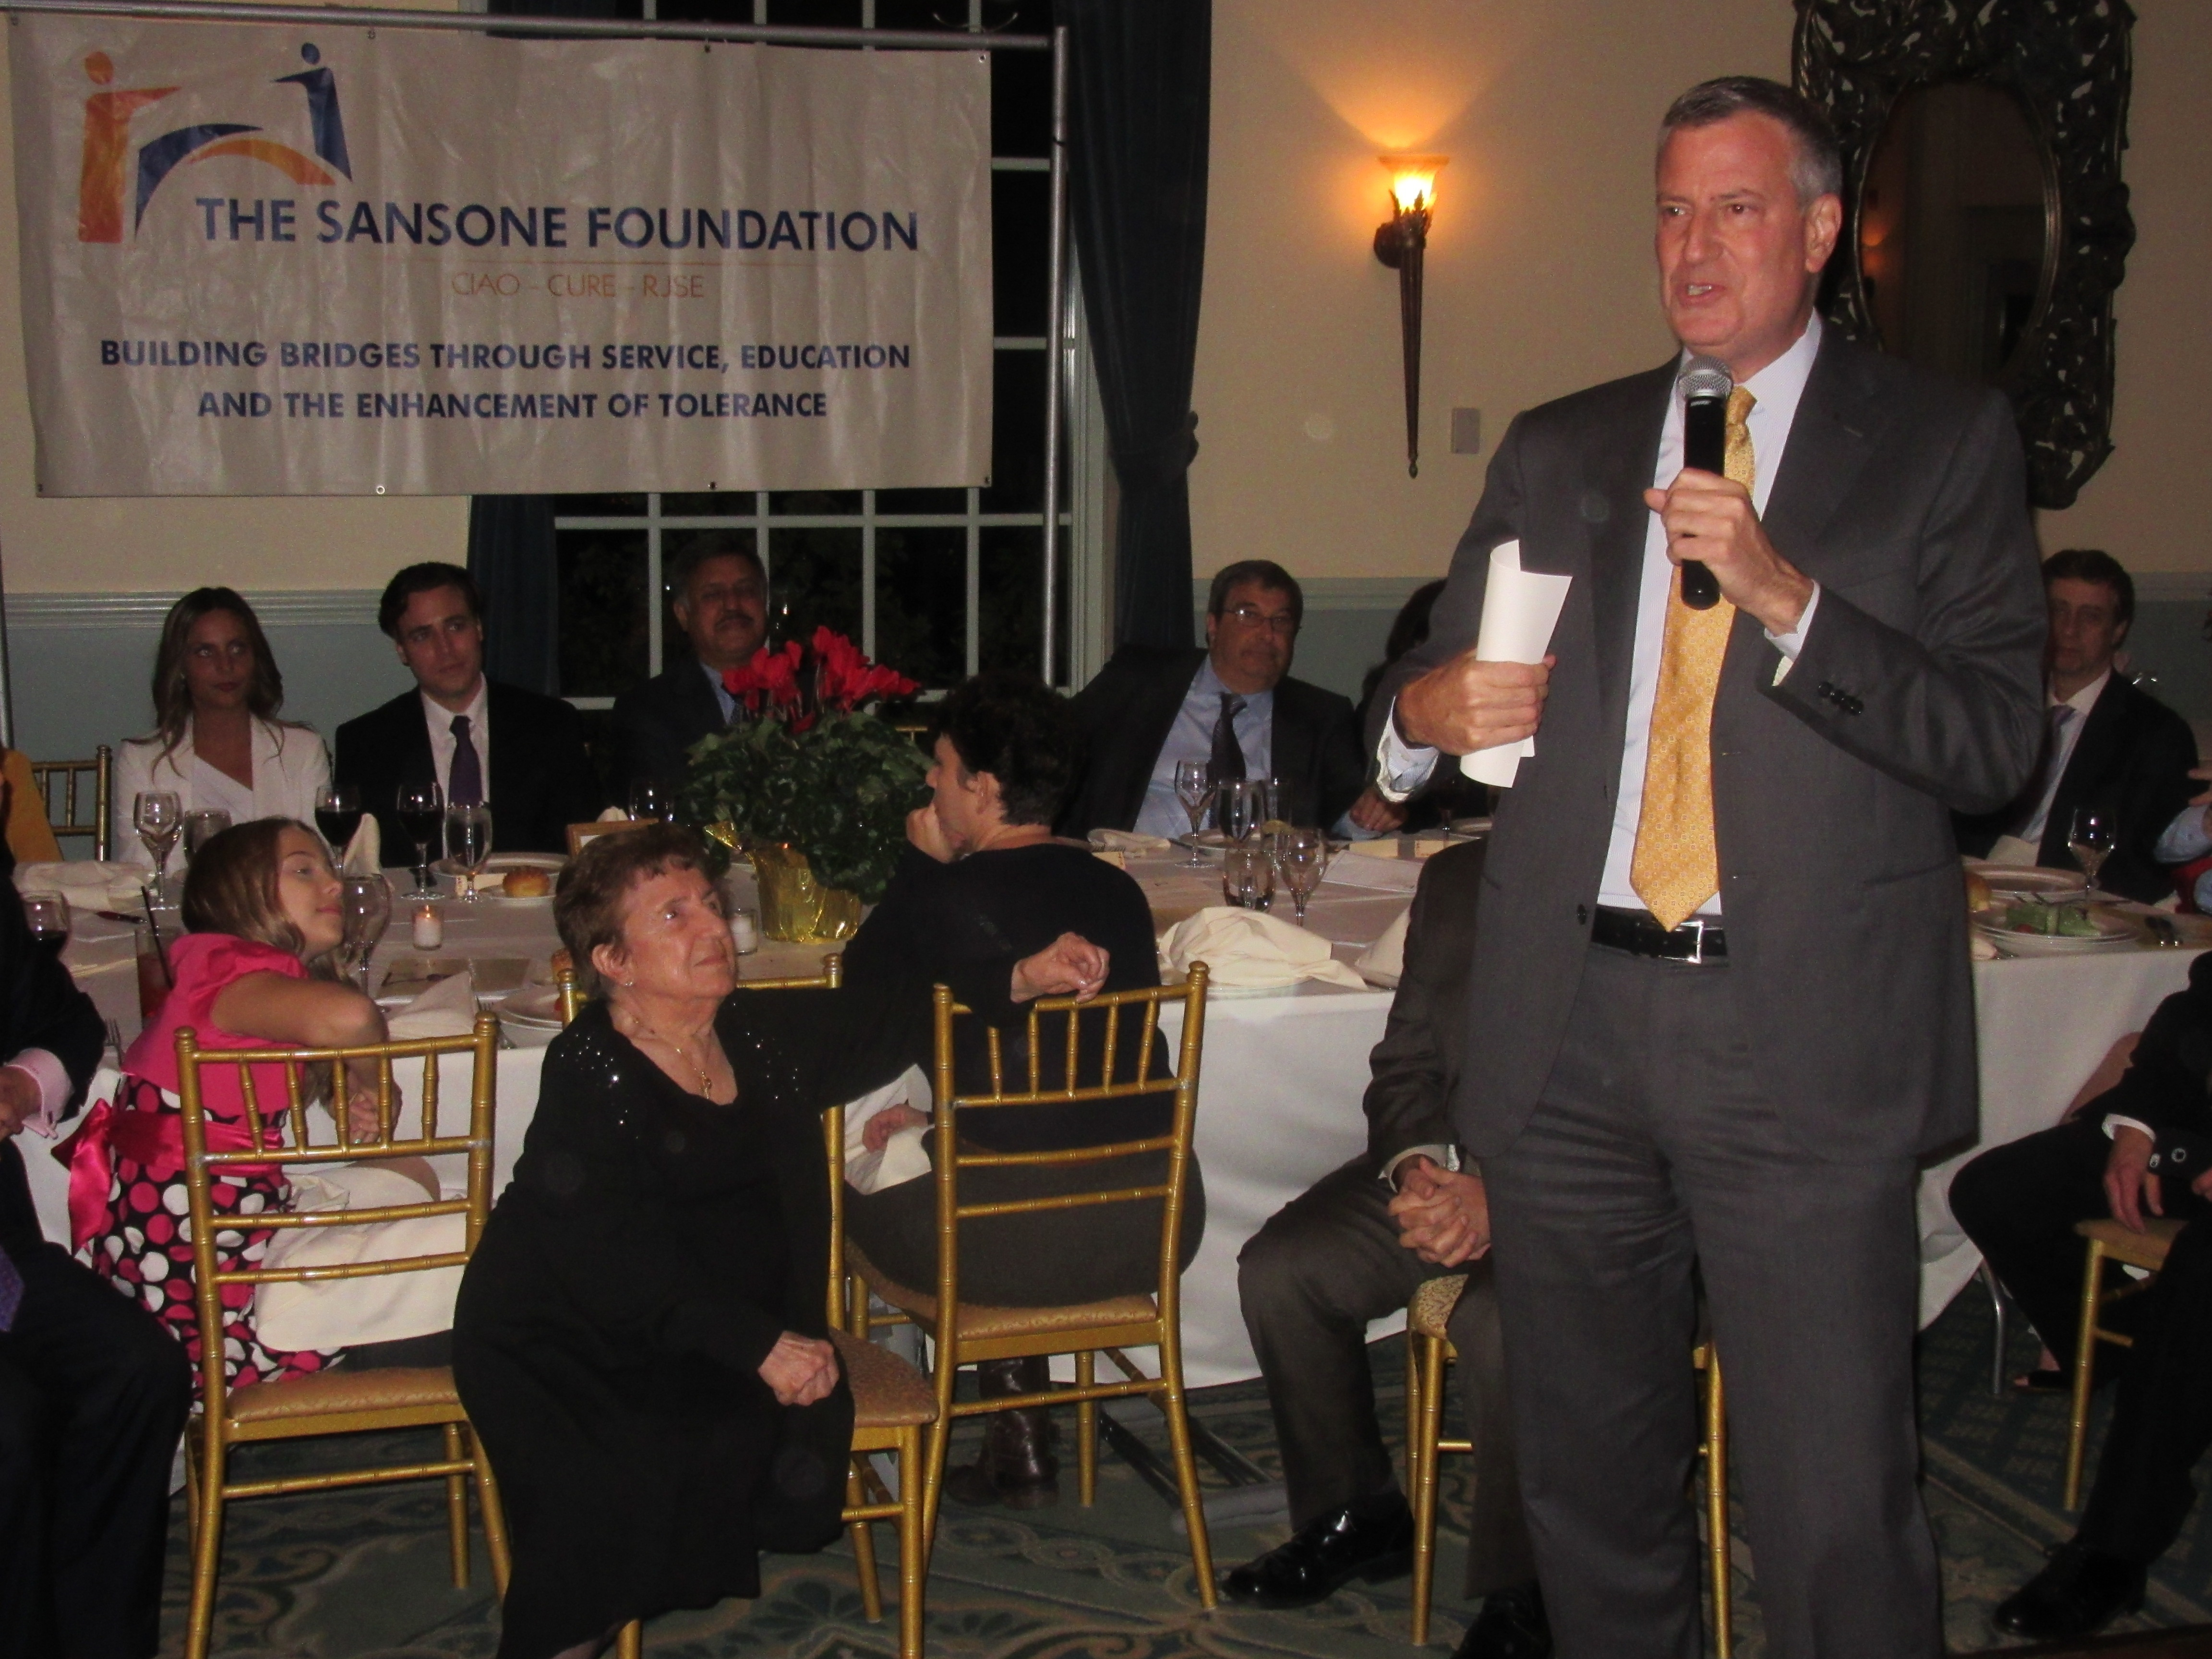 Mayor Bill de Blasio speaks at the Sansone Foundation dinner (Photo: Will Bredderman).